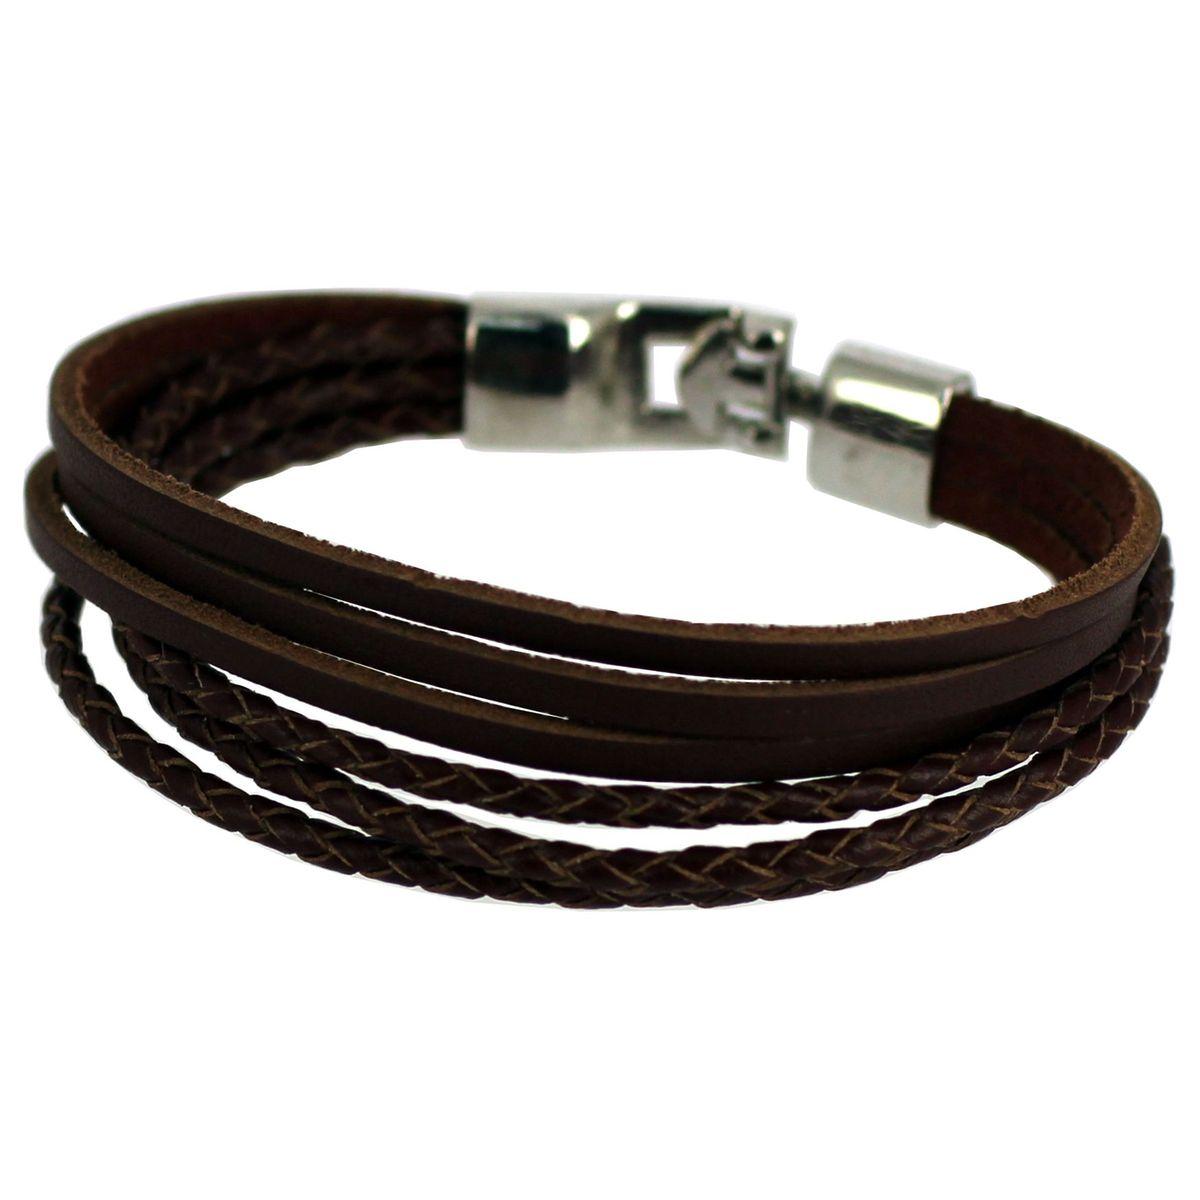 Bracelet cuir véritable marron 21 cm acier inoxydable So Chic Bijoux